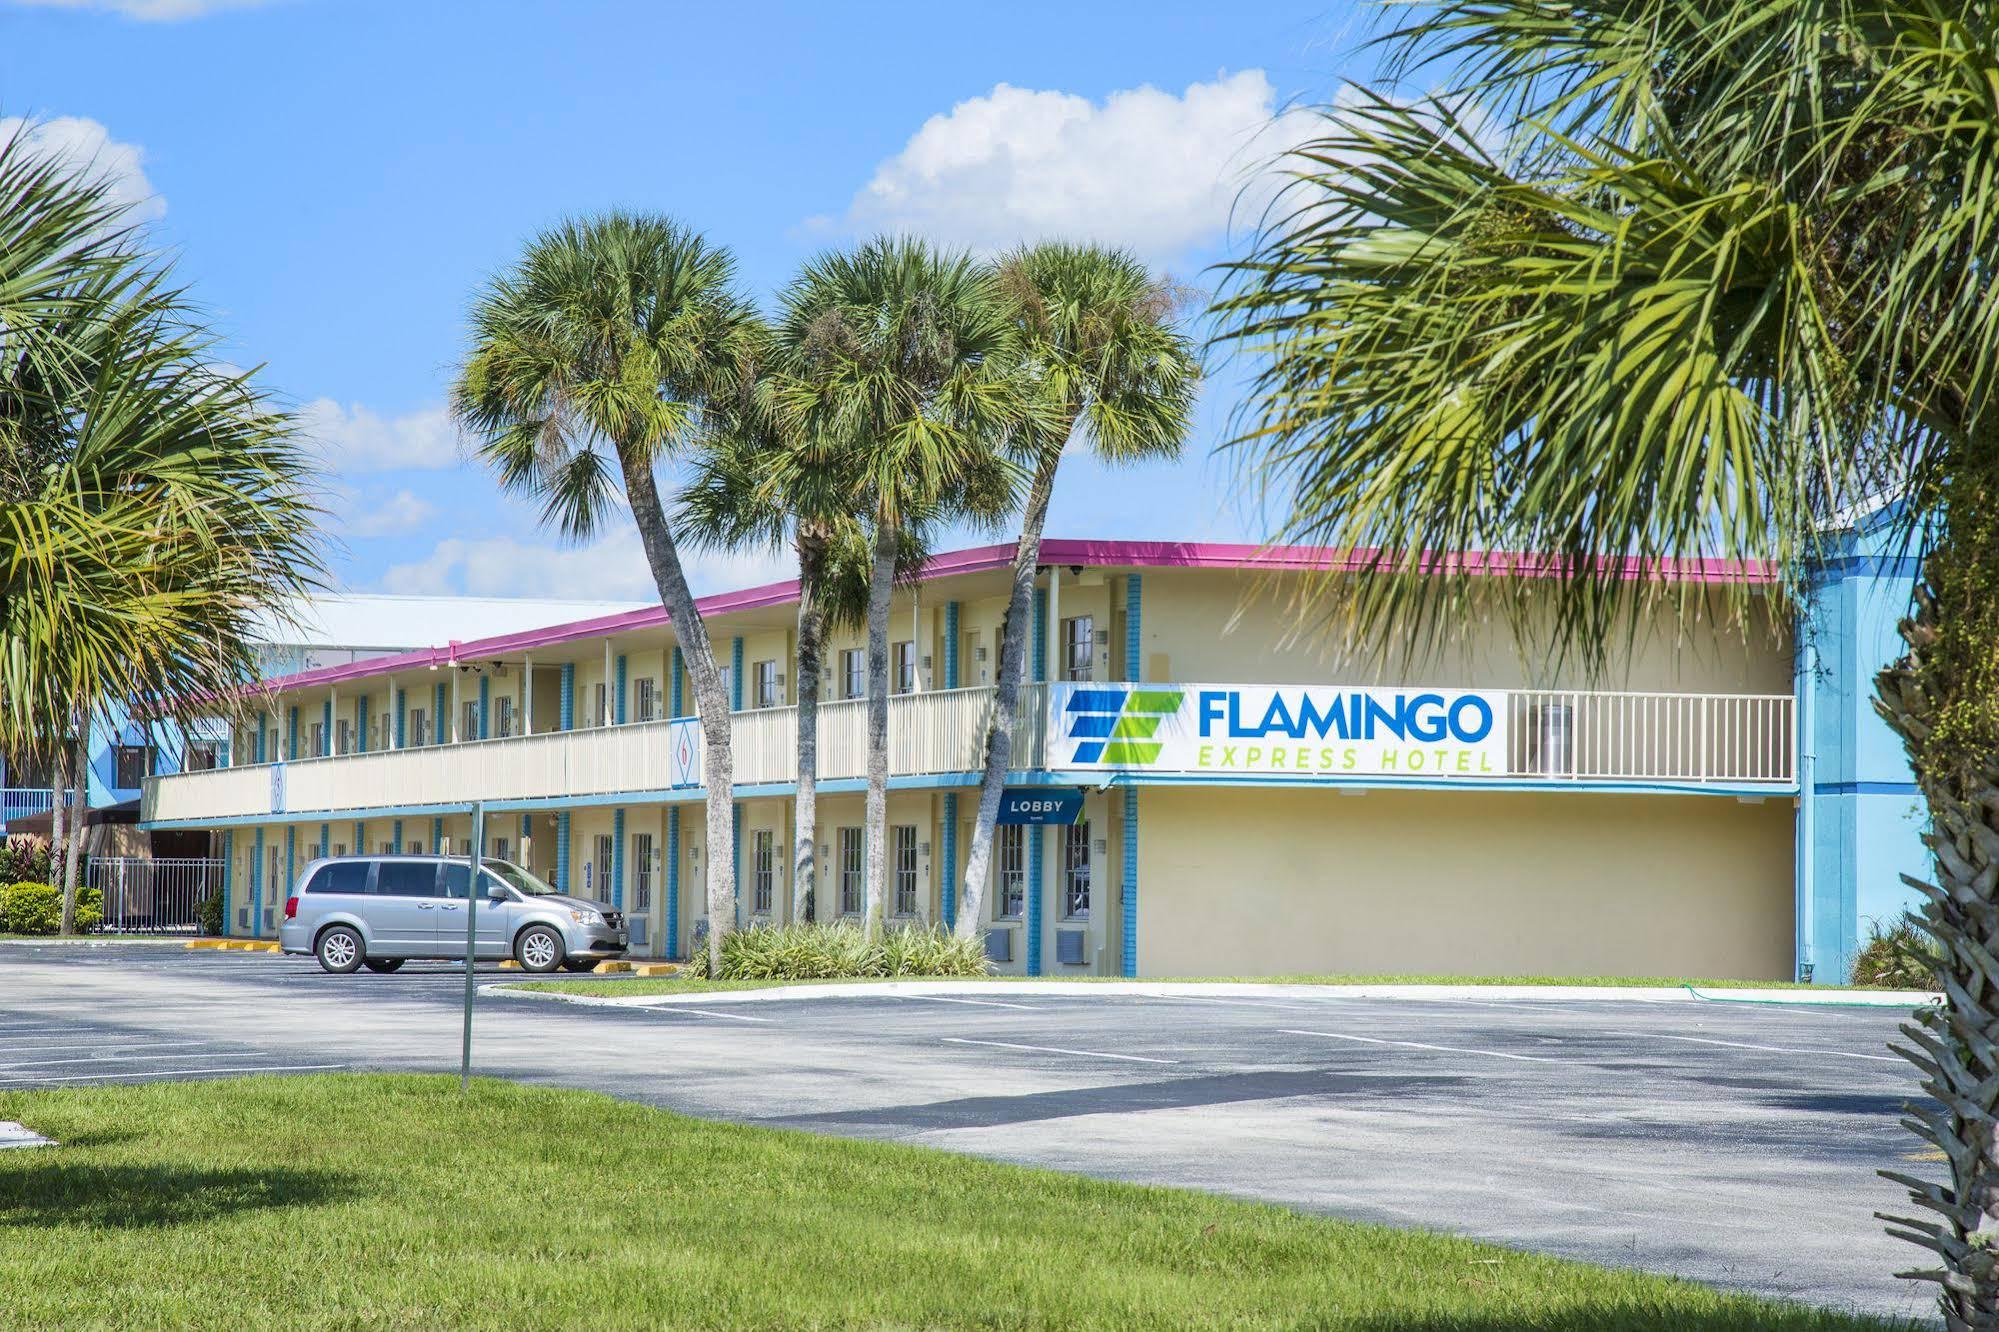 Flamingo Express